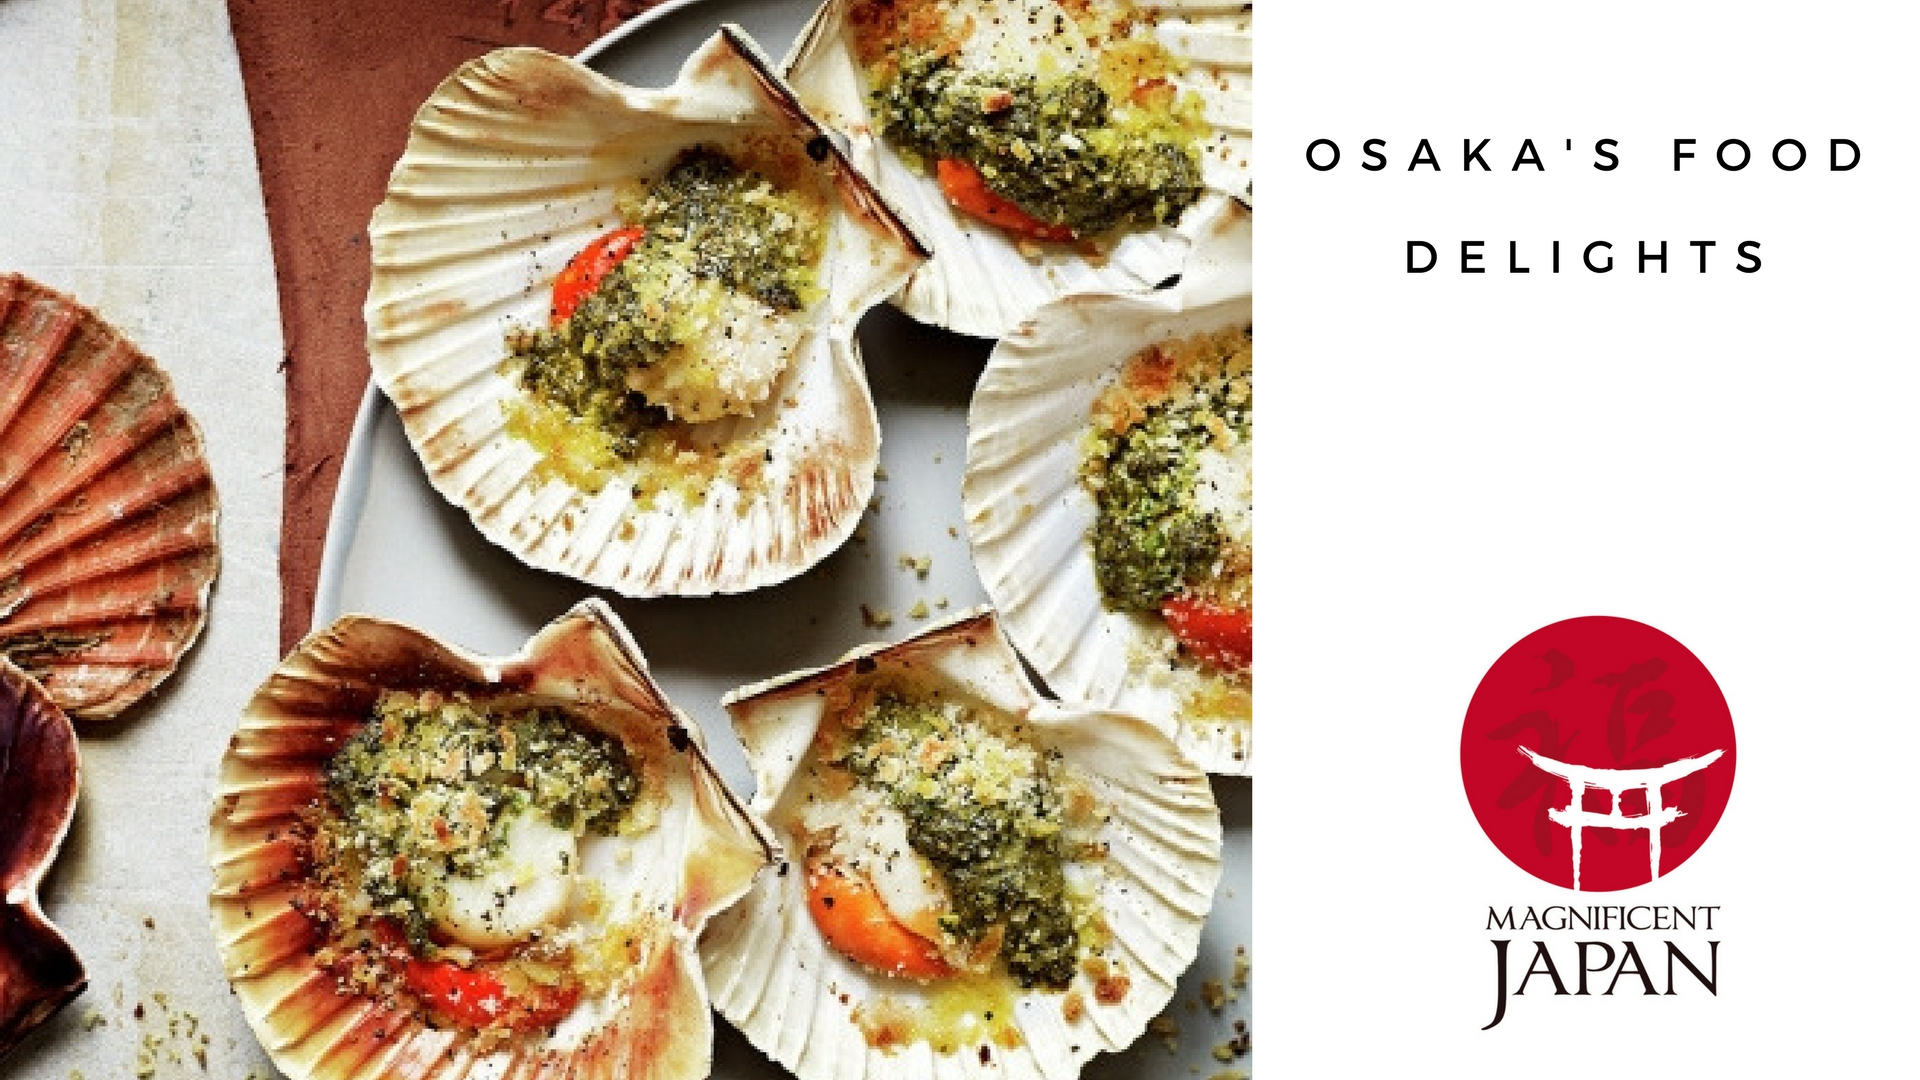 osakas food delights - Osaka's Food Delights